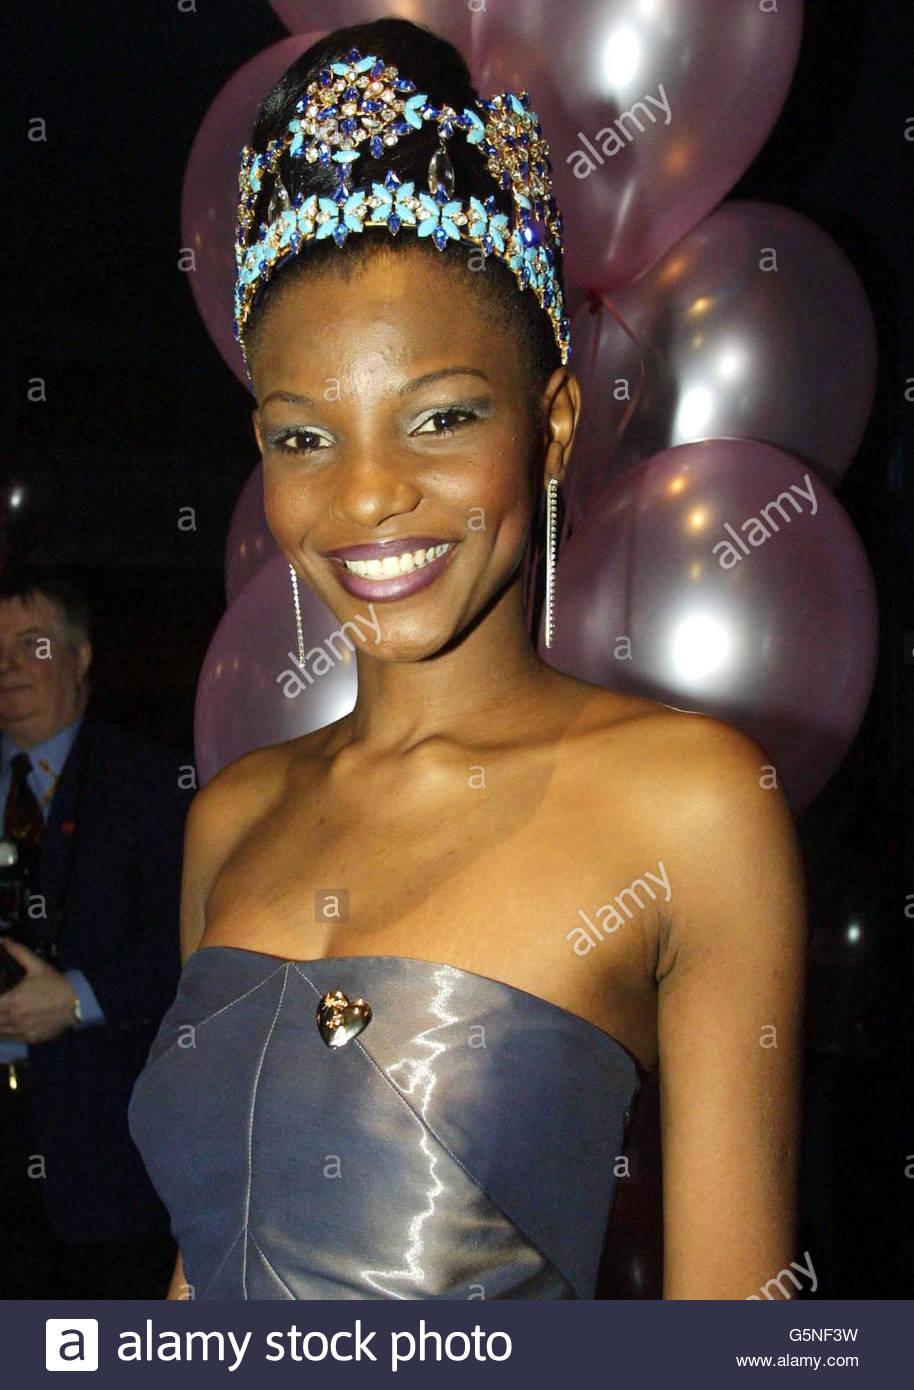 agbani darego, miss world 2001. School10